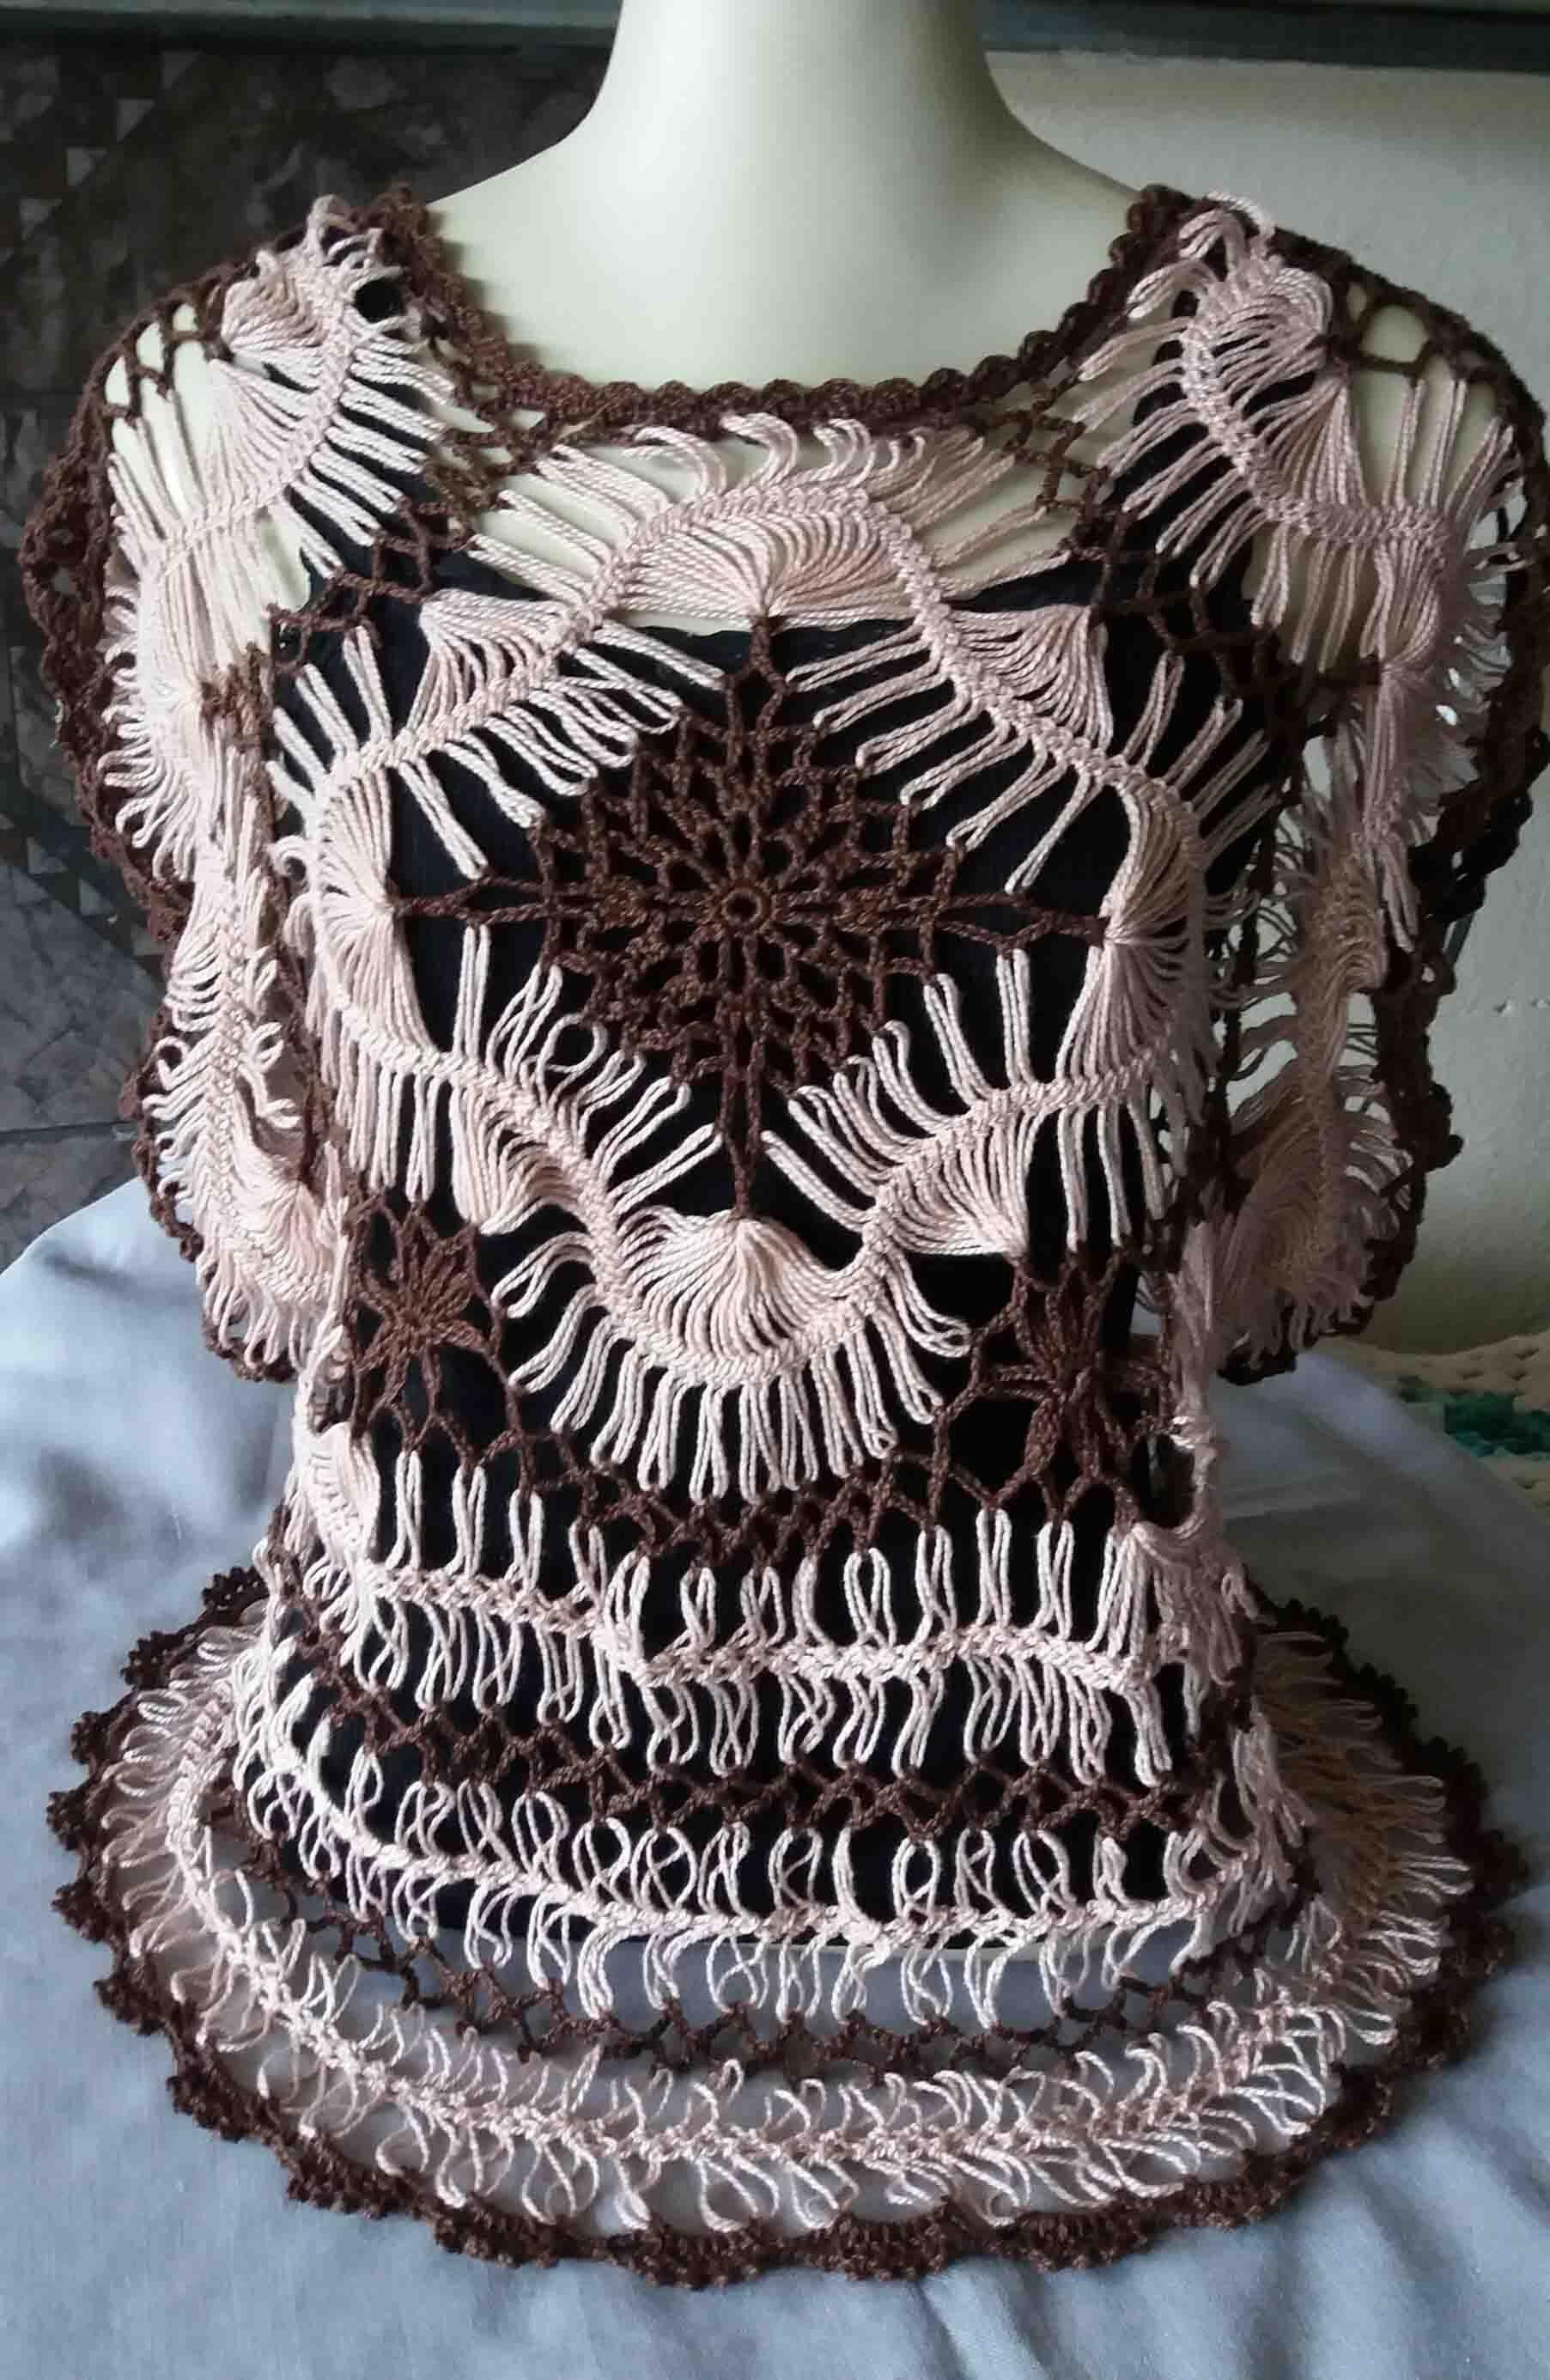 Blusa bege com marrom de croch de grampo blusa crochet blusa bege com marrom de croch de grampo hairpin crochet patternlace bankloansurffo Image collections